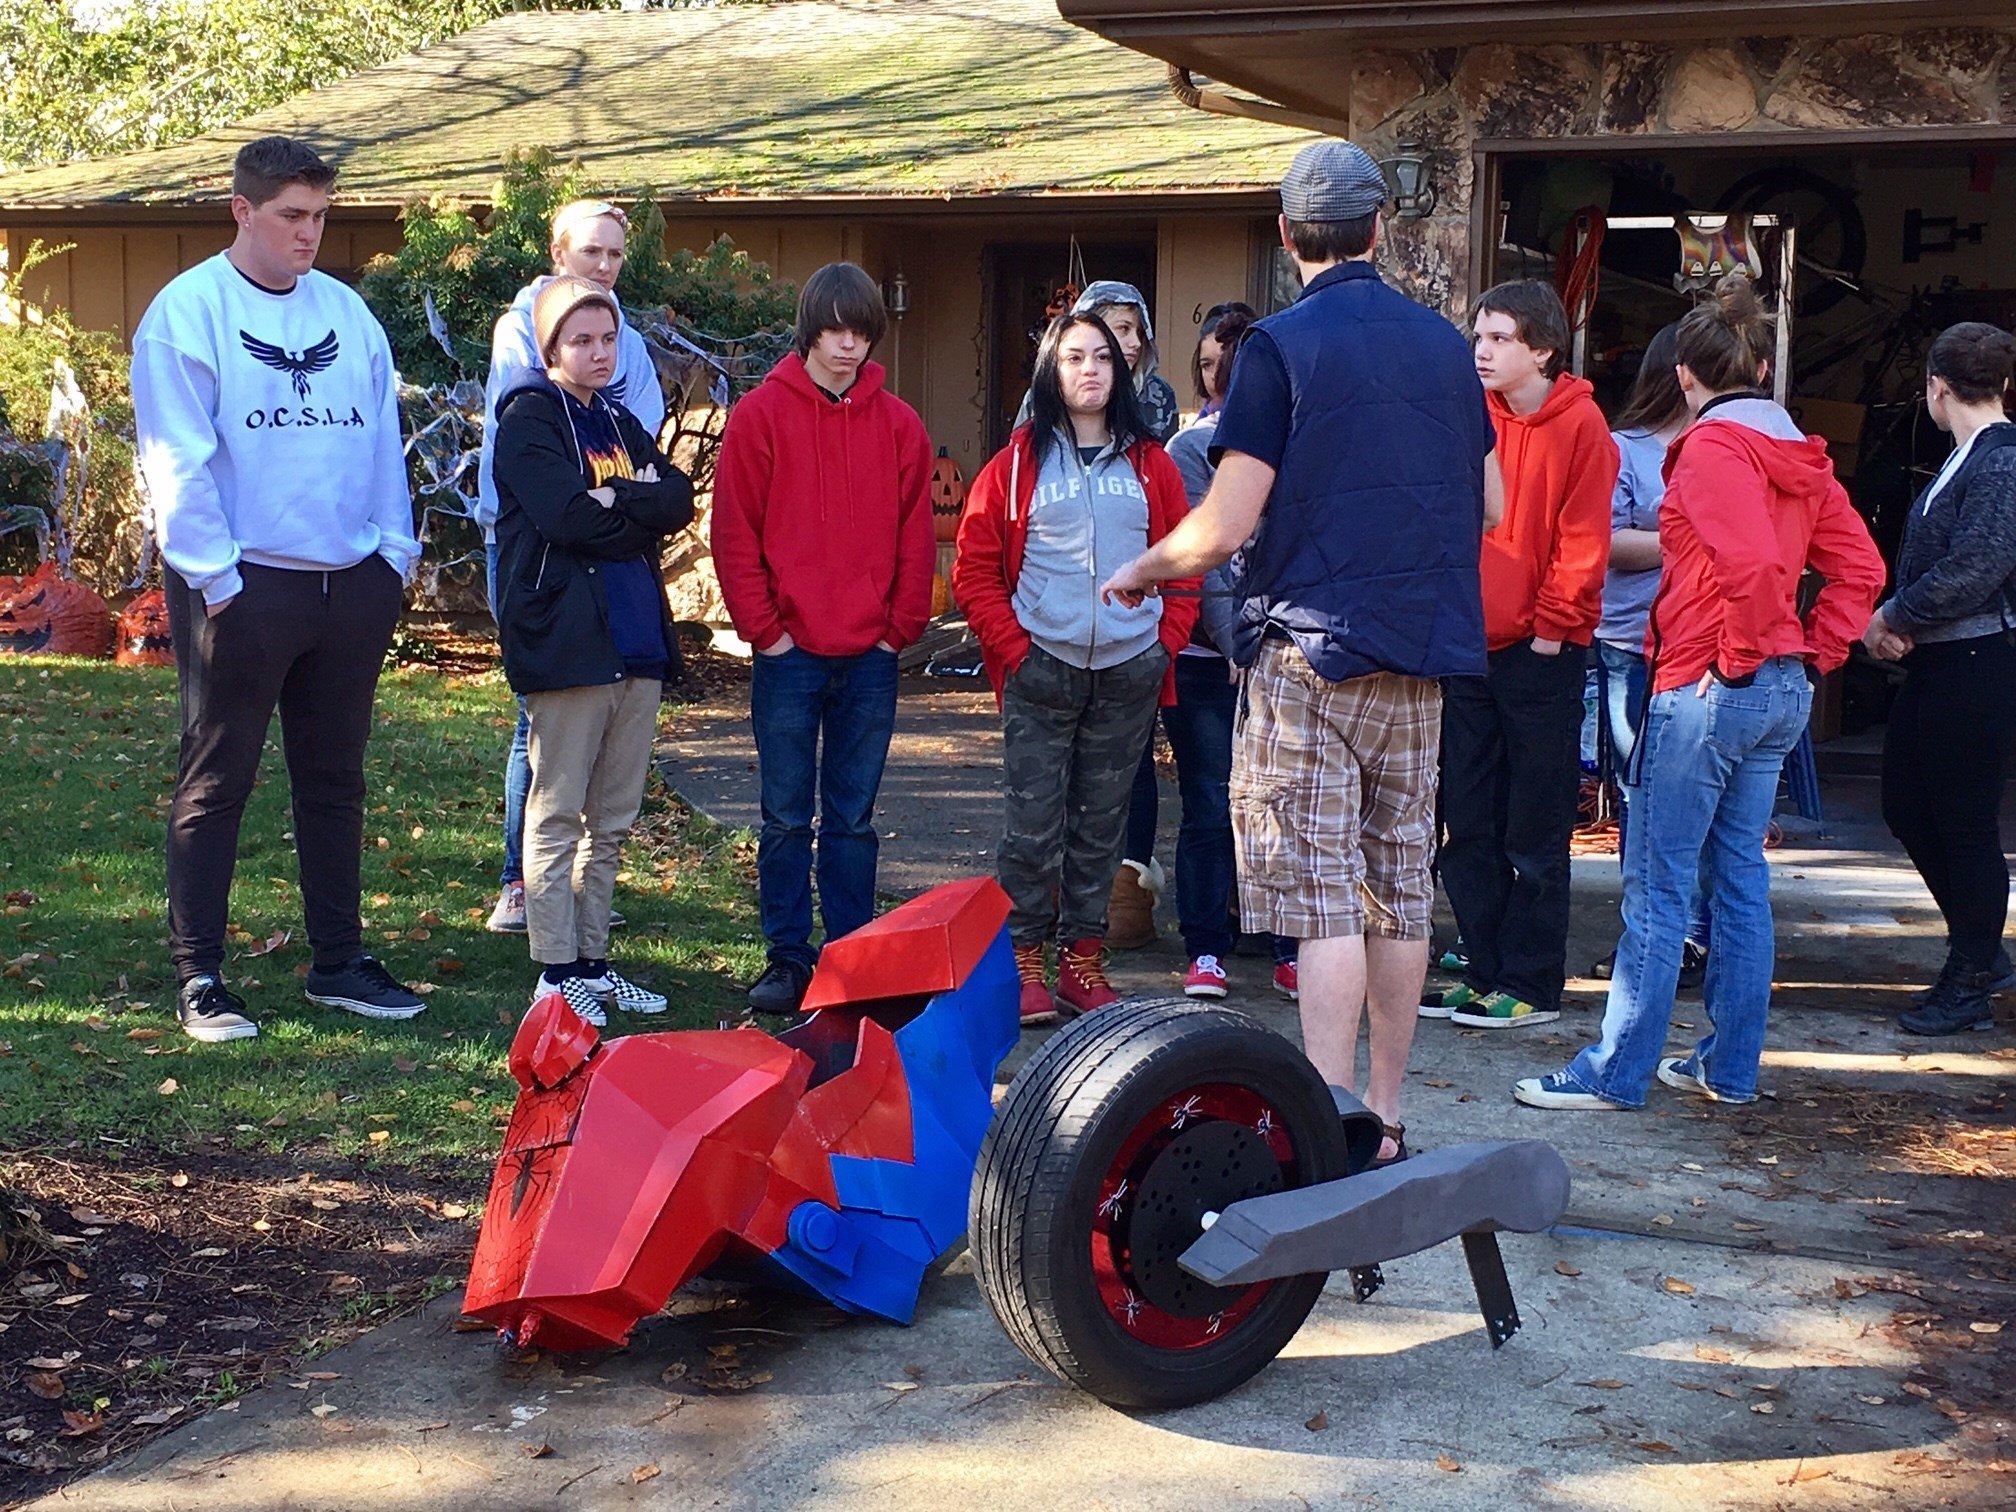 OCSLA students meeting with Magic Wheelchair founder Ryan Weimer. (KPTV)